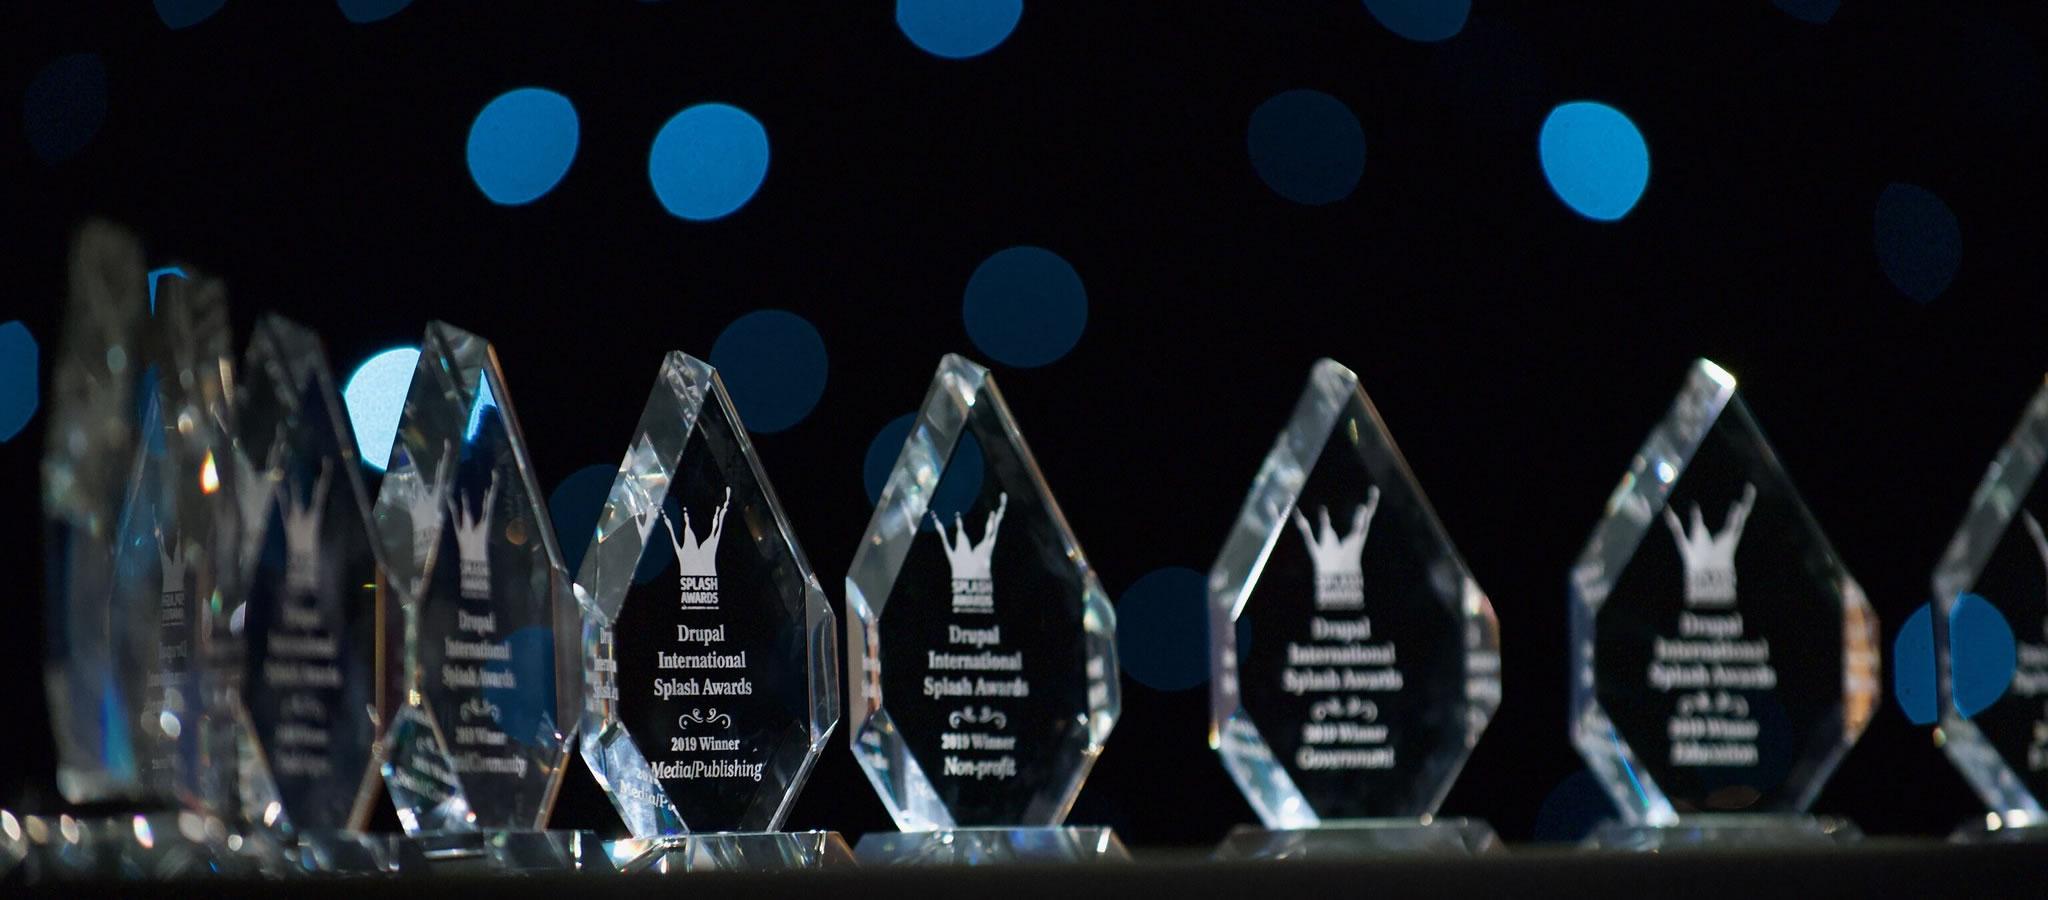 "Non-profit: Drupal International Splash Awards"" v Seattle (USA)"